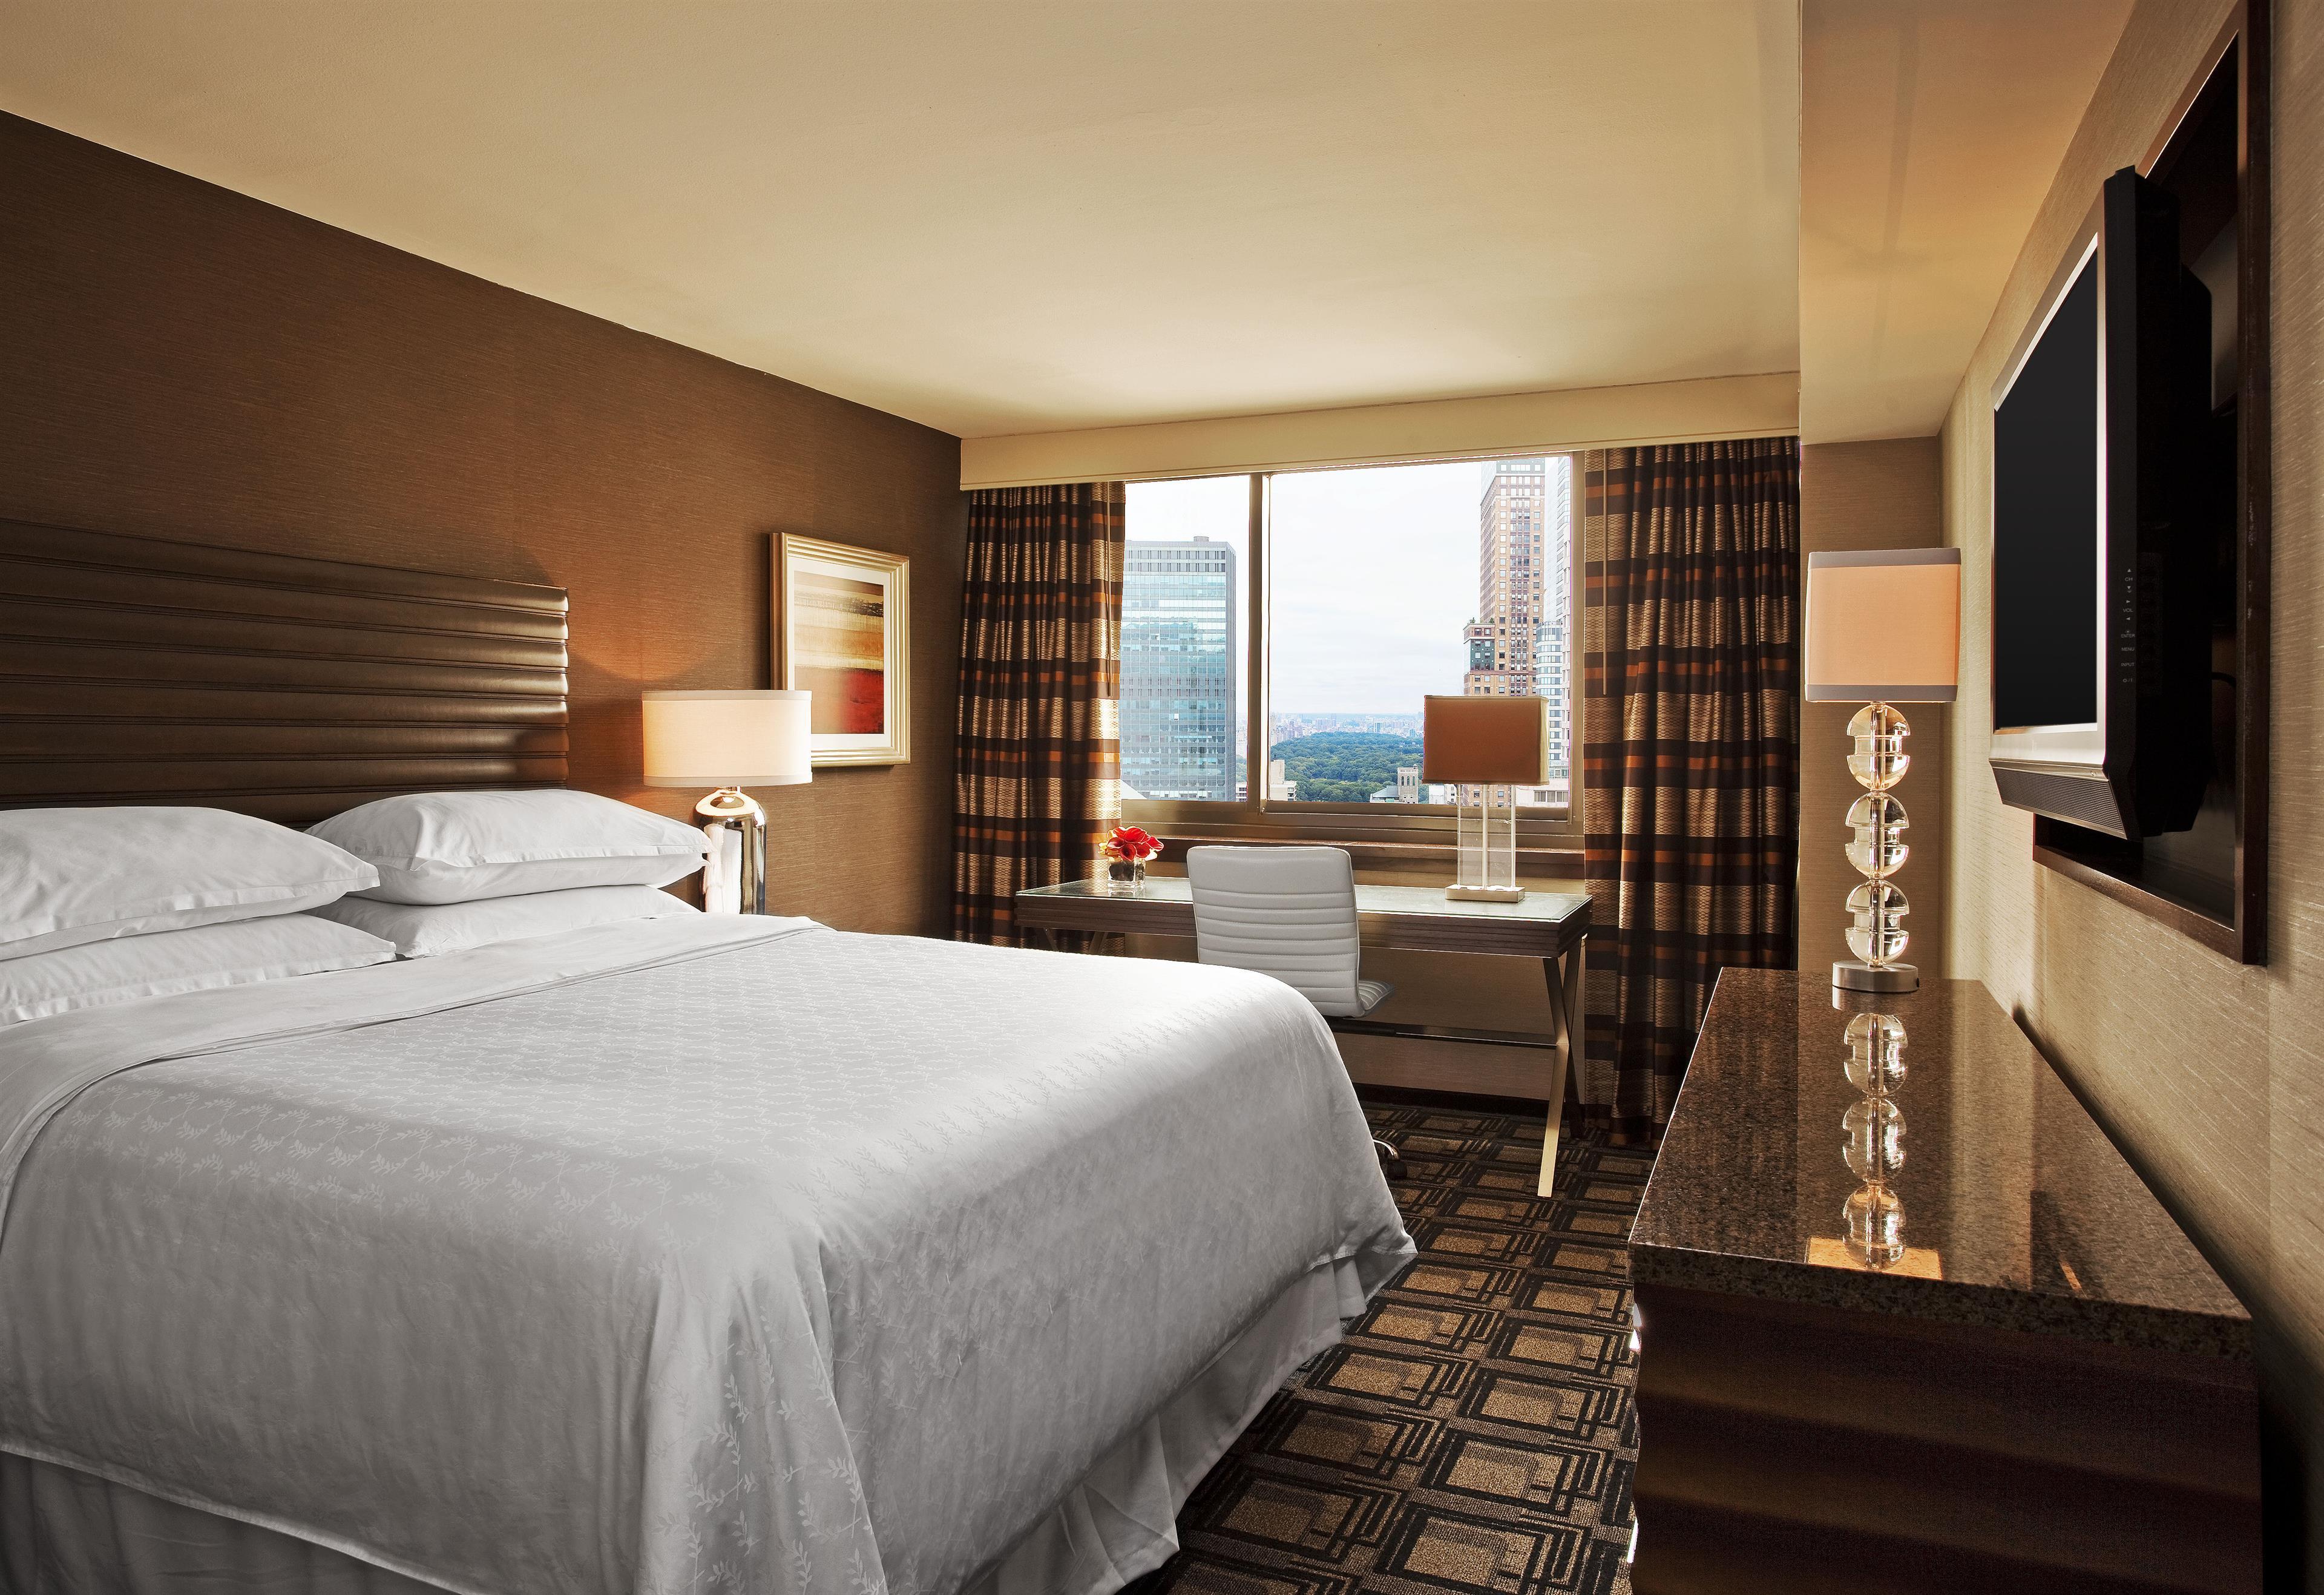 Sheraton New York Times Square Hotel image 12